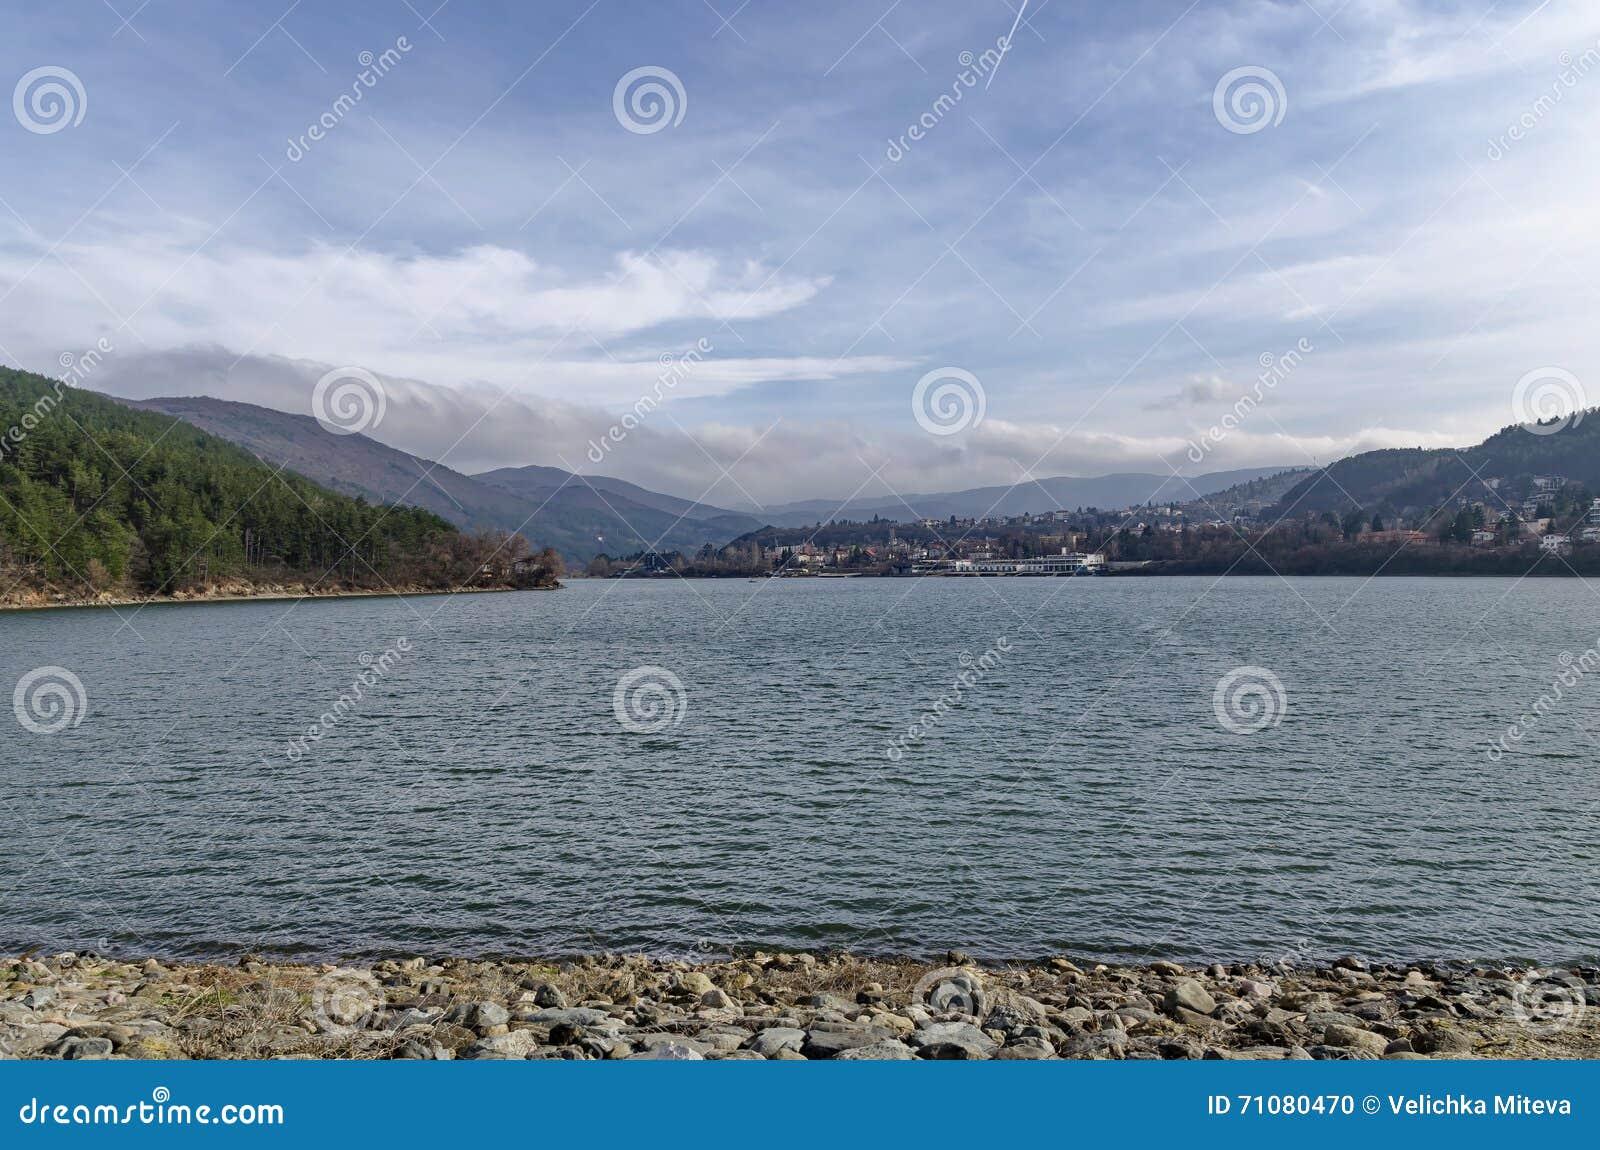 Look toward environment of picturesque dam, gather water of Iskar river